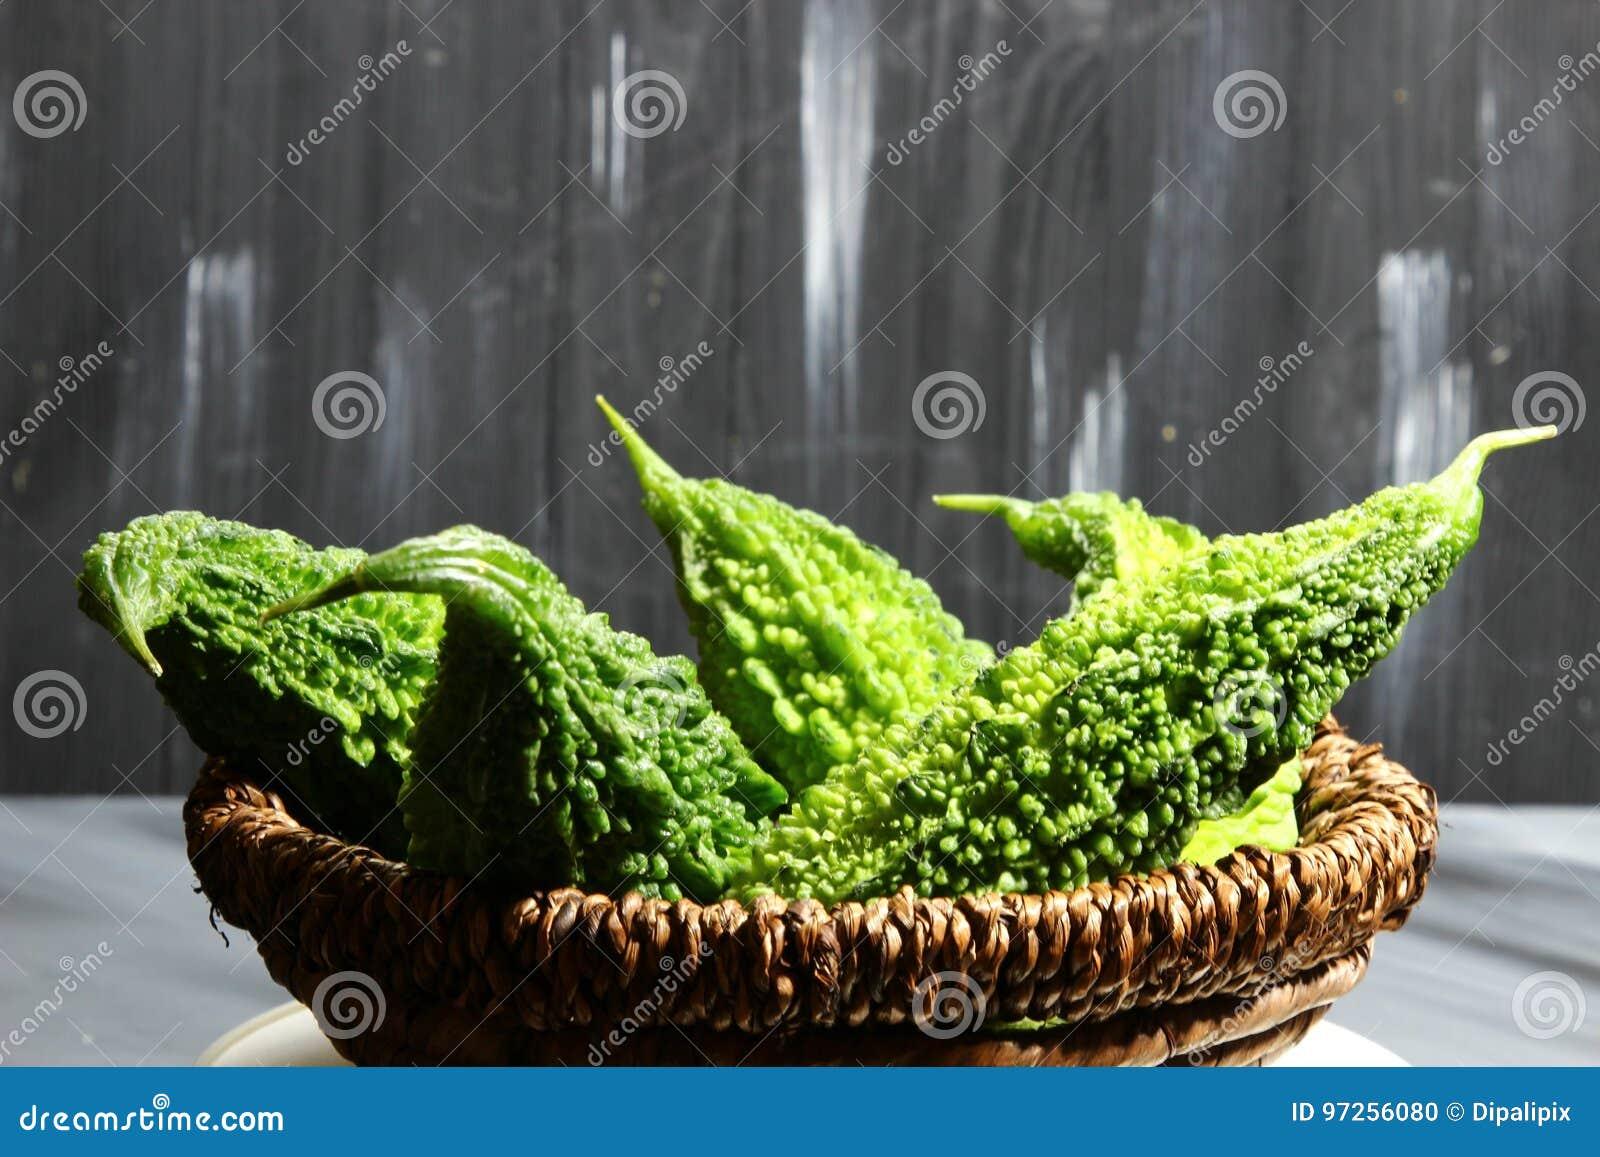 A Basket Of Green Bitter Gourd Or Karela, A Bitter Fruit